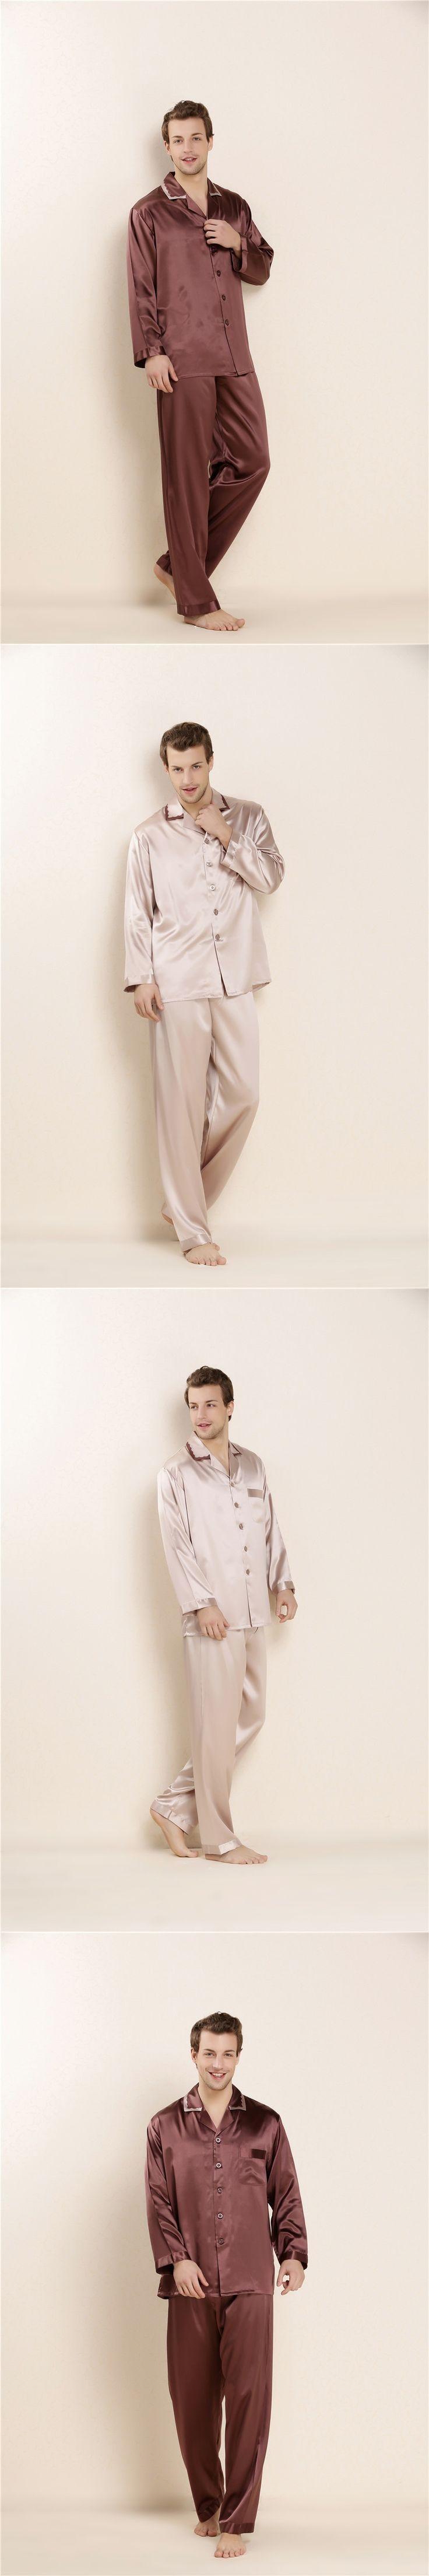 2017 Mens 100% Real Silk Summer Pajamas Sets Male Loungewear Solid Sleepwear Shirt + Pant  2pcs Long Sleeve Homedress LX80032M